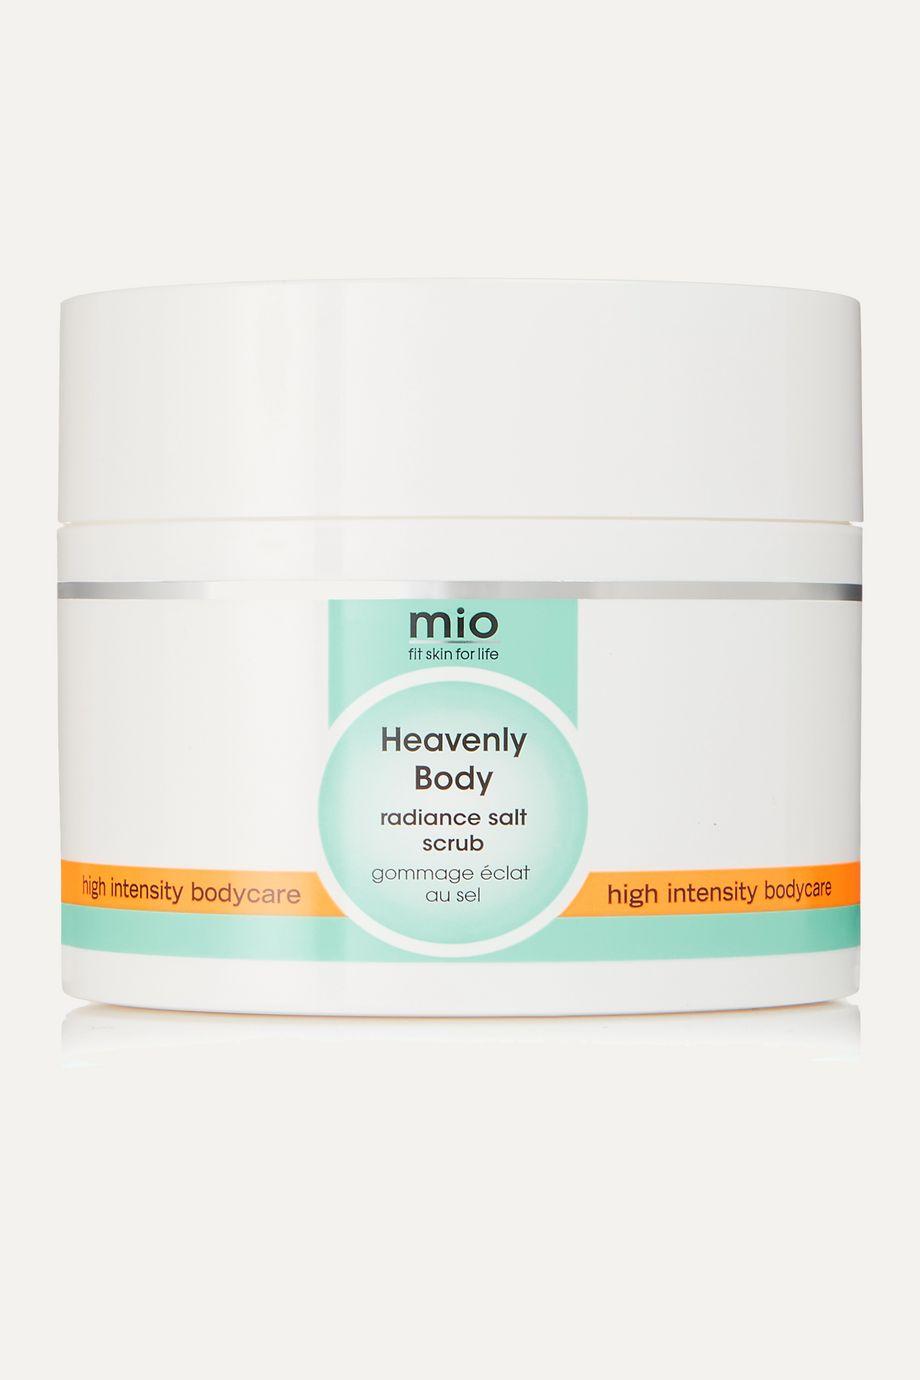 Mio Skincare Heavenly Body Radiance Salt Scrub, 300g